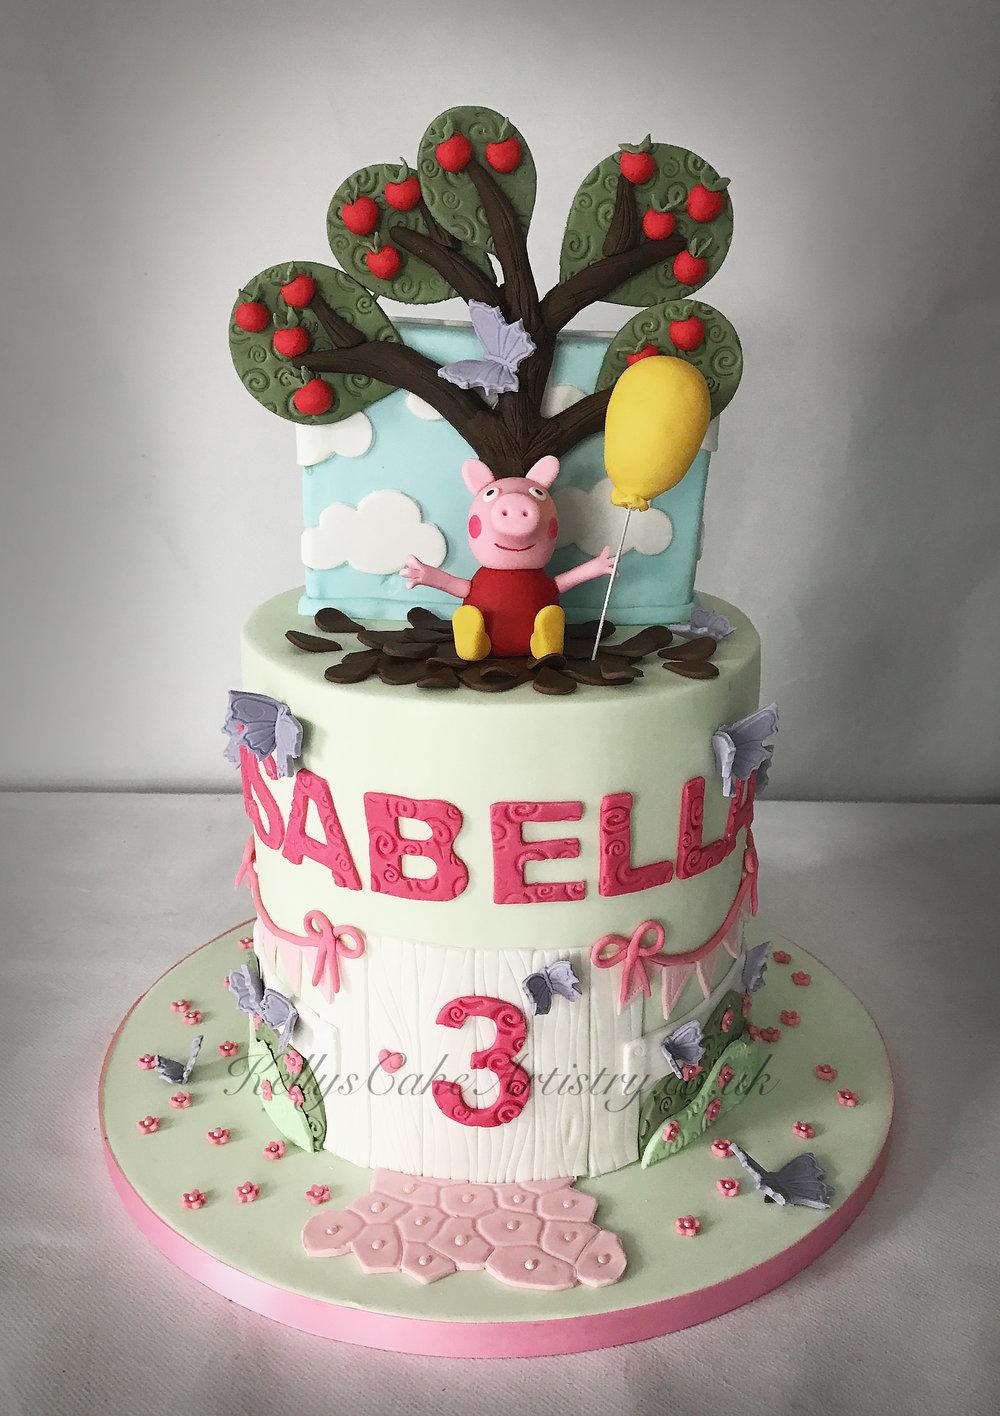 Isabella5 watermarked.jpg